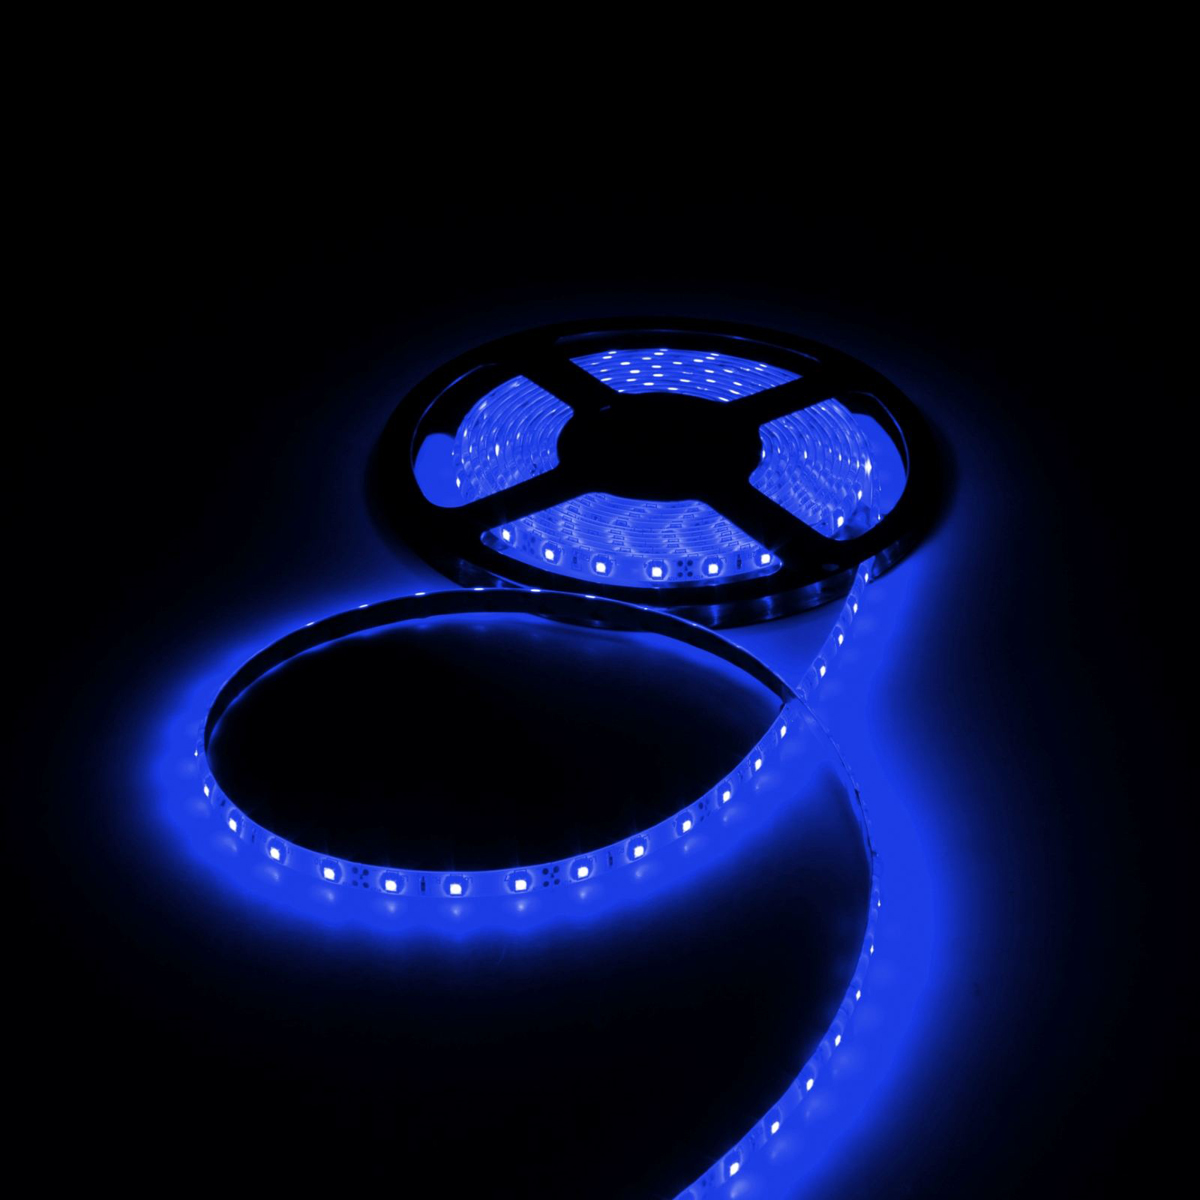 Светодиодная лента Luazon, 12В, SMD3528, длина 5 м, IP65, 60 LED ламп, 4.8 Вт/м, 6-7 Лм/1 LED, DC, цвет: синий светодиодная лента luazon 12в smd3528 длина 5 м ip68 60 led ламп 4 8 вт м 6 7 лм 1 led dc цвет фиолетовый